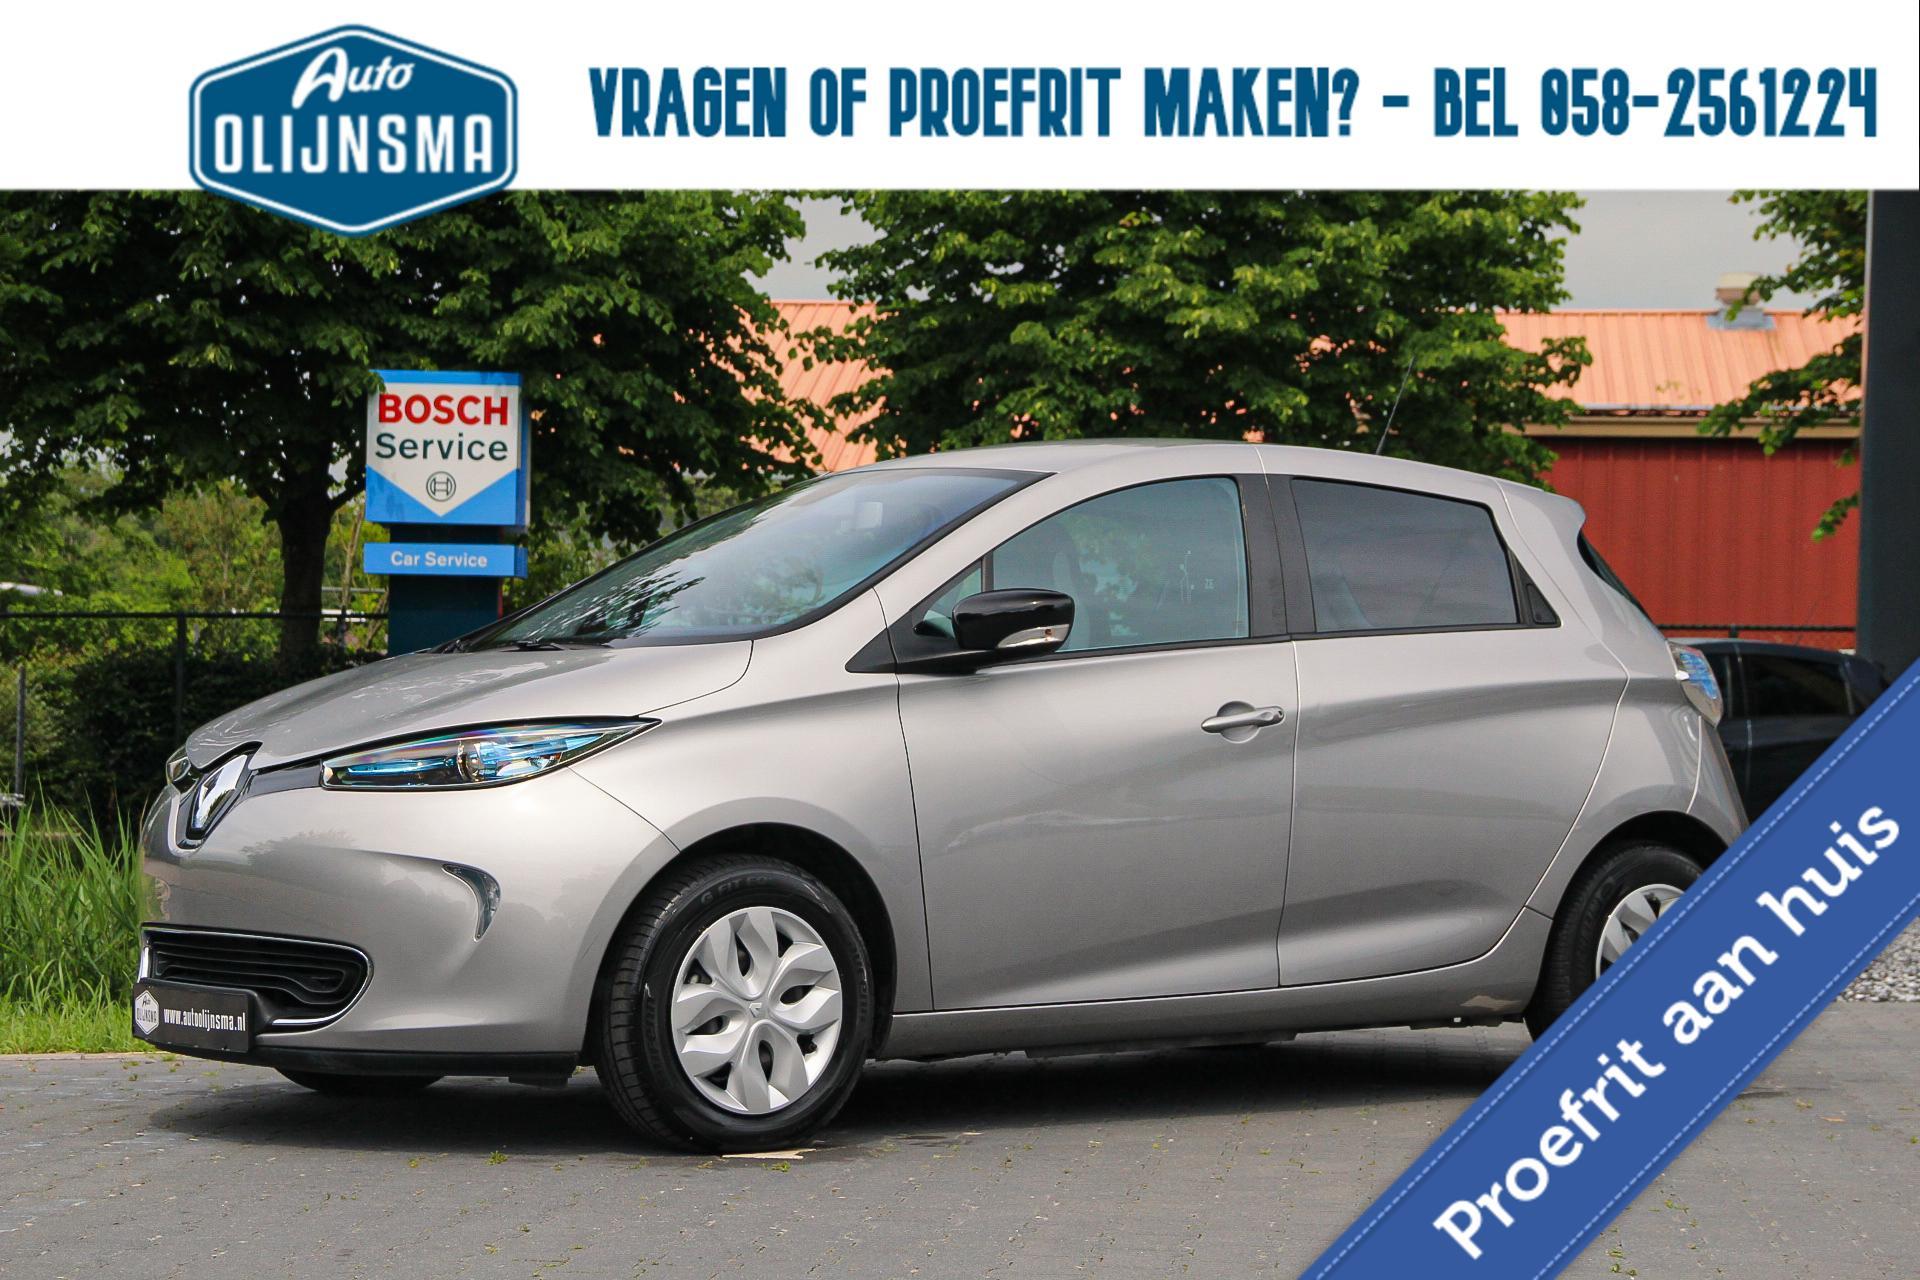 Renault Zoe R90 Entry 22 kWh|Clima|Navi|AccuHuur